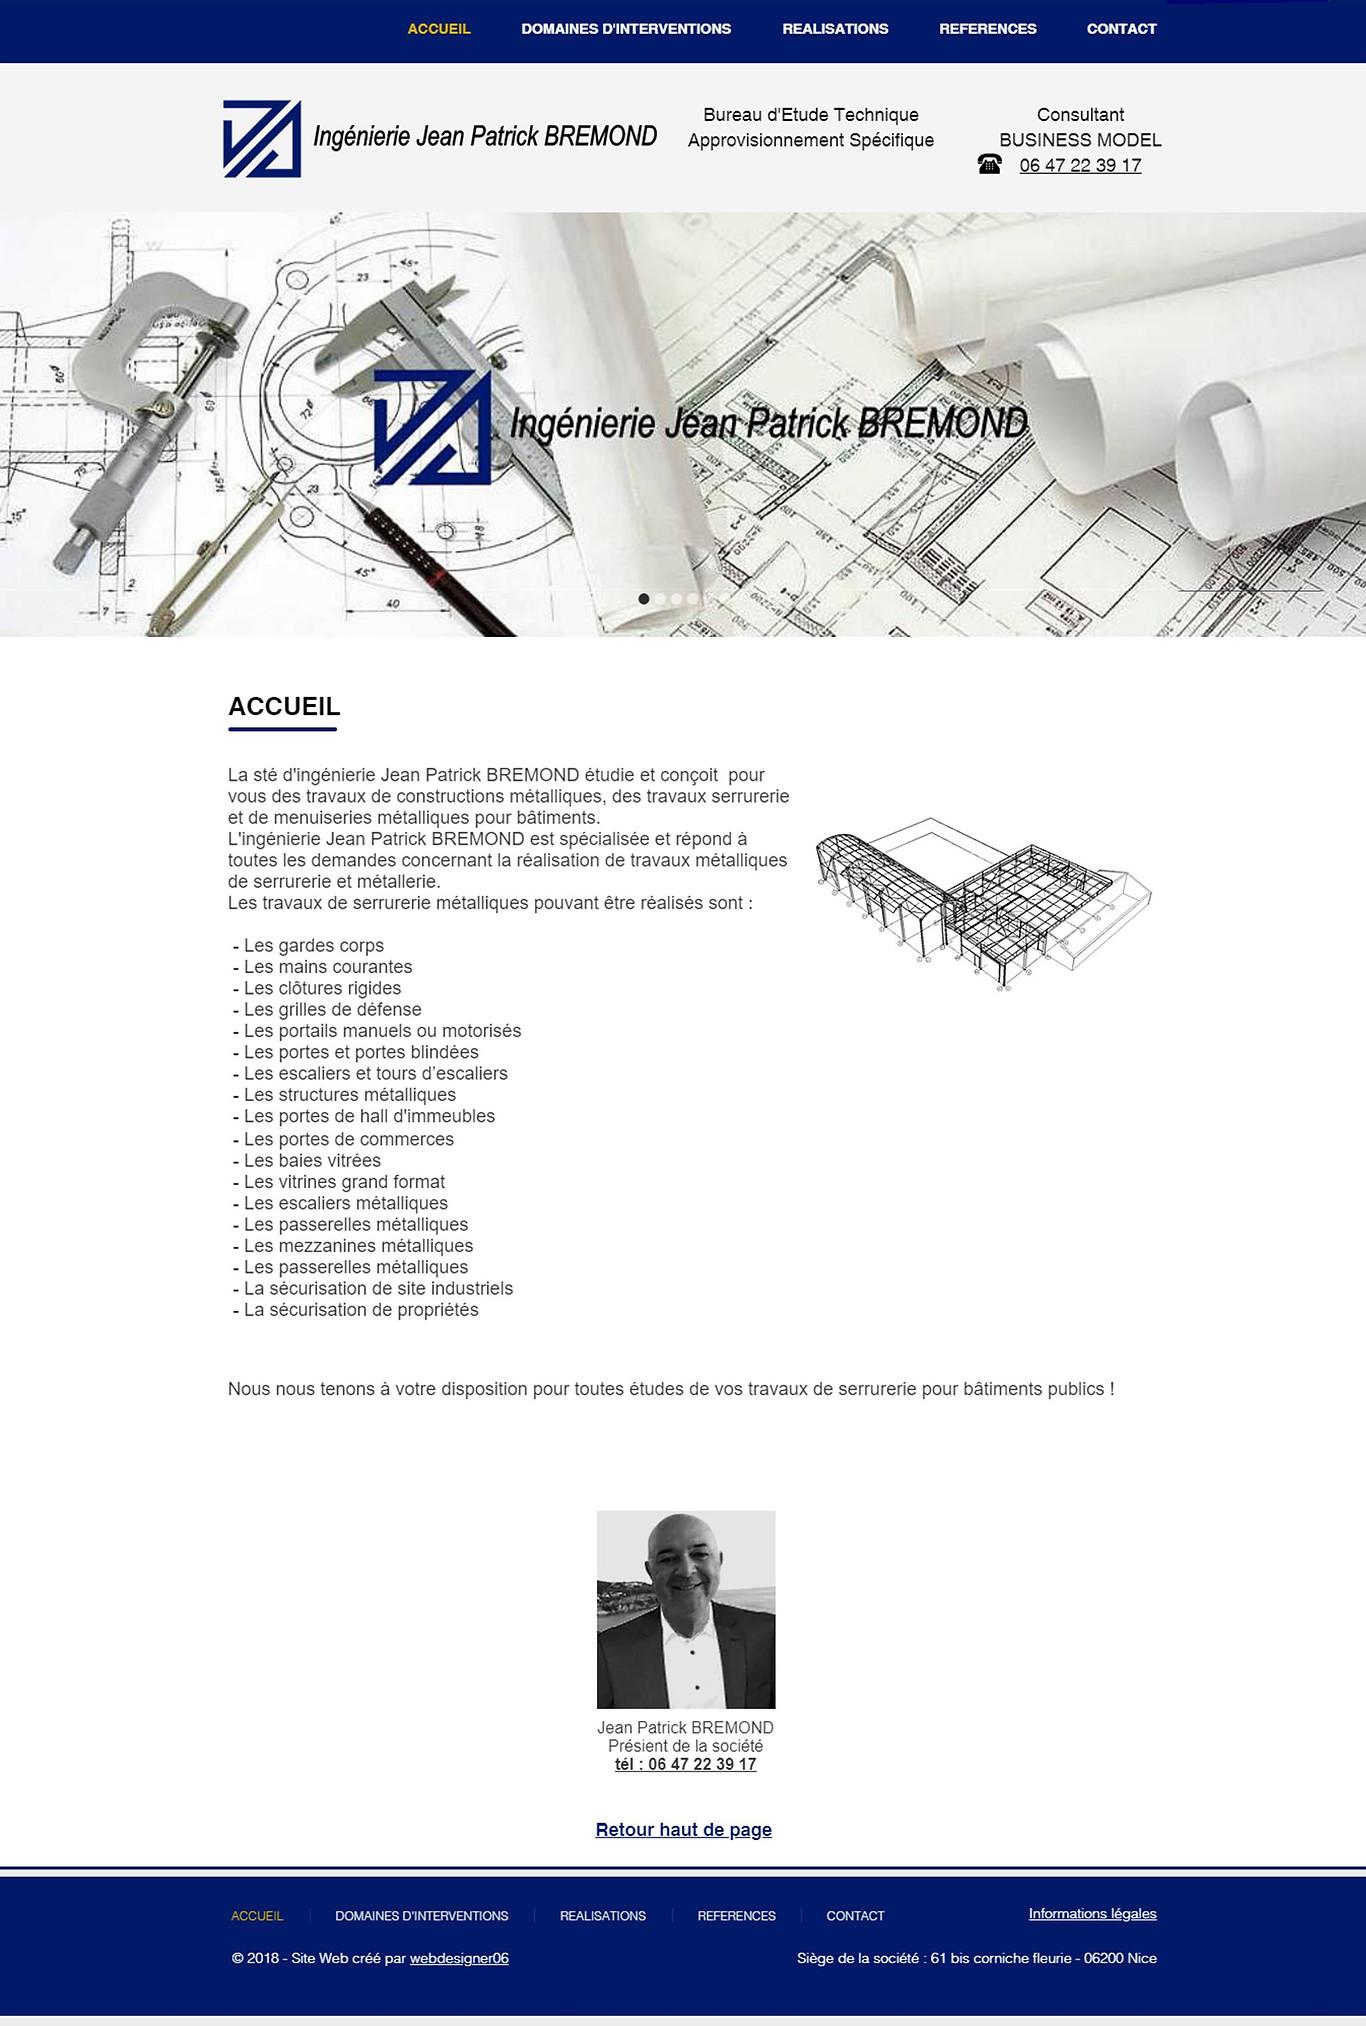 Ingénierie JP Brémond by webdesigner06